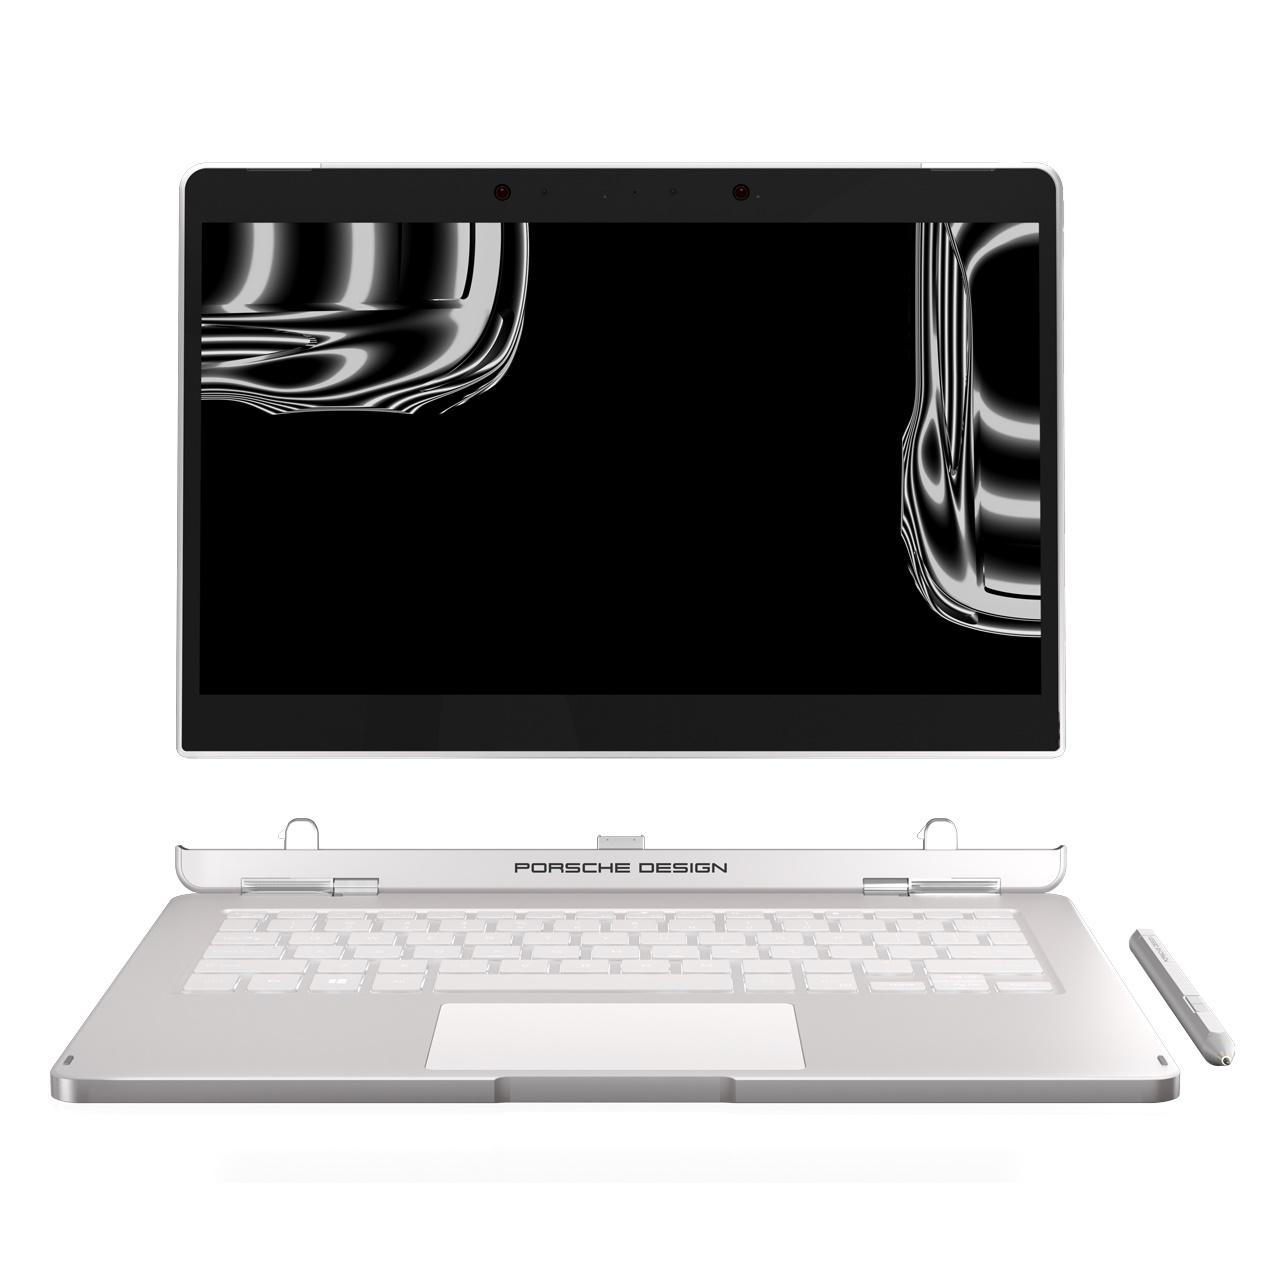 بوک وان؛ لپتاپ-تبلت ۱۰ میلیون تومانی هوآوی قاتل سرفیس بوک مایکروسافت